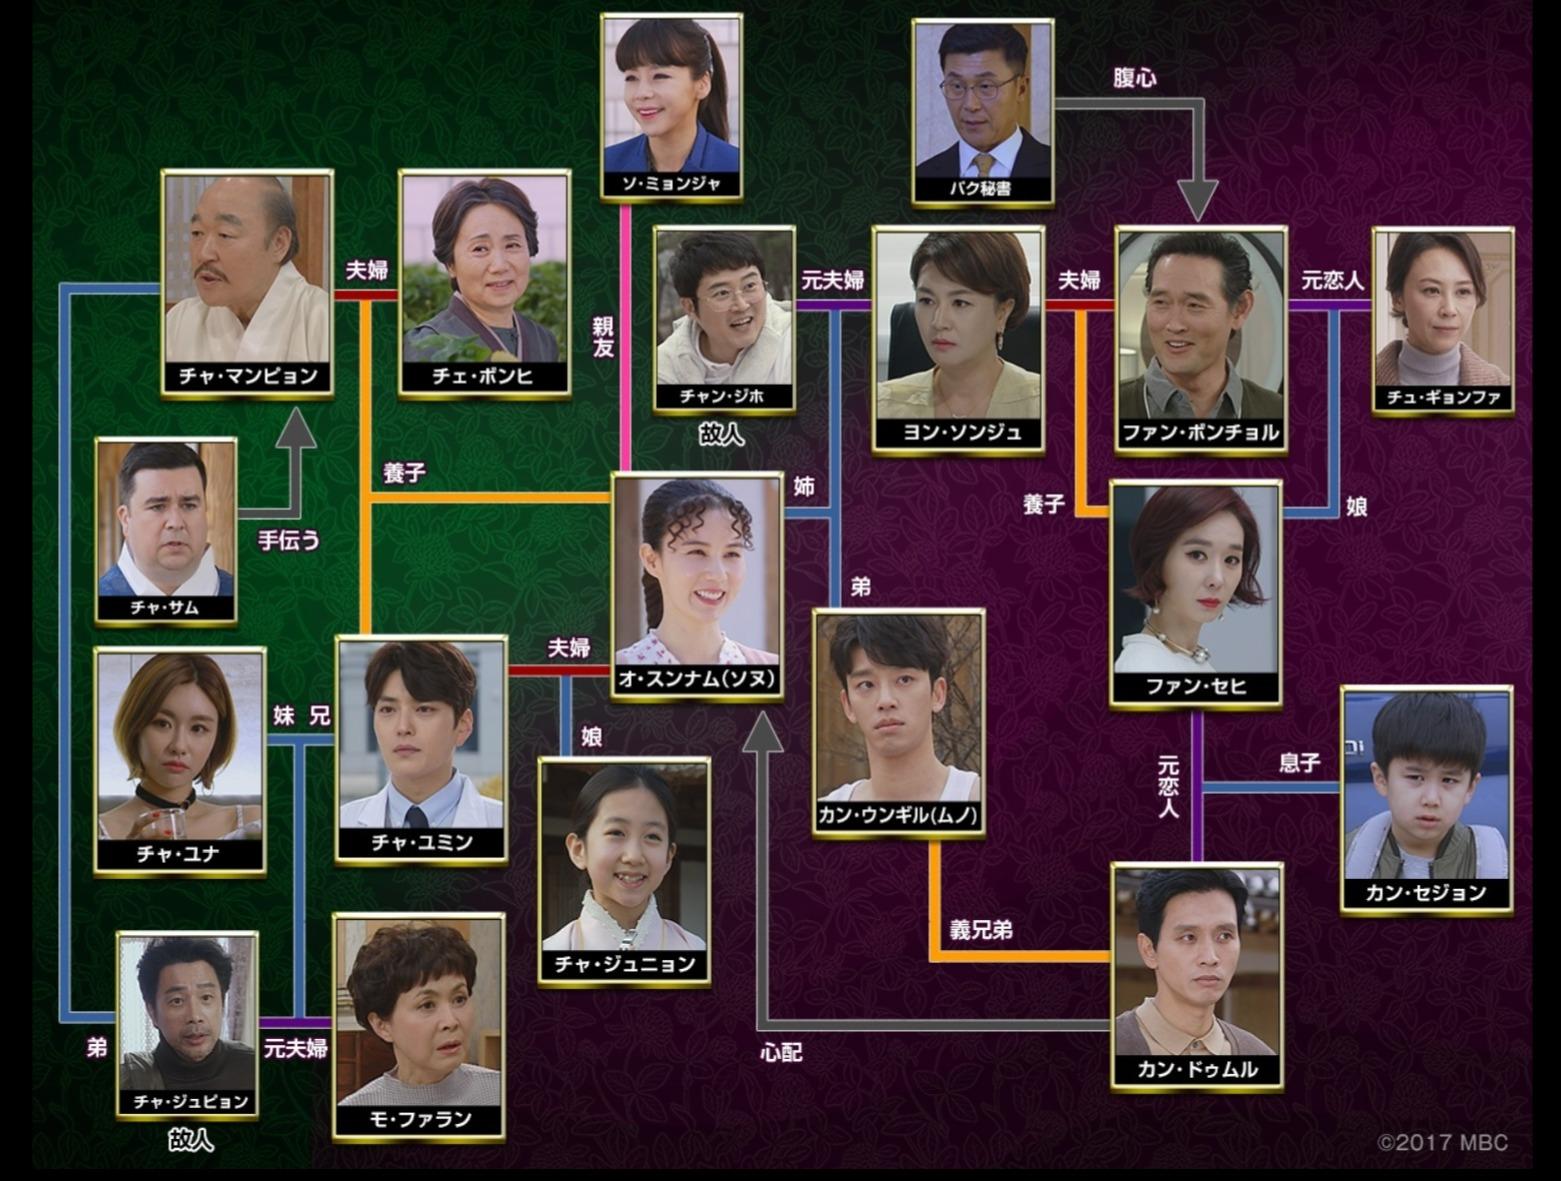 韓国ドラマ『白詰草』登場人物相関図(関係図)